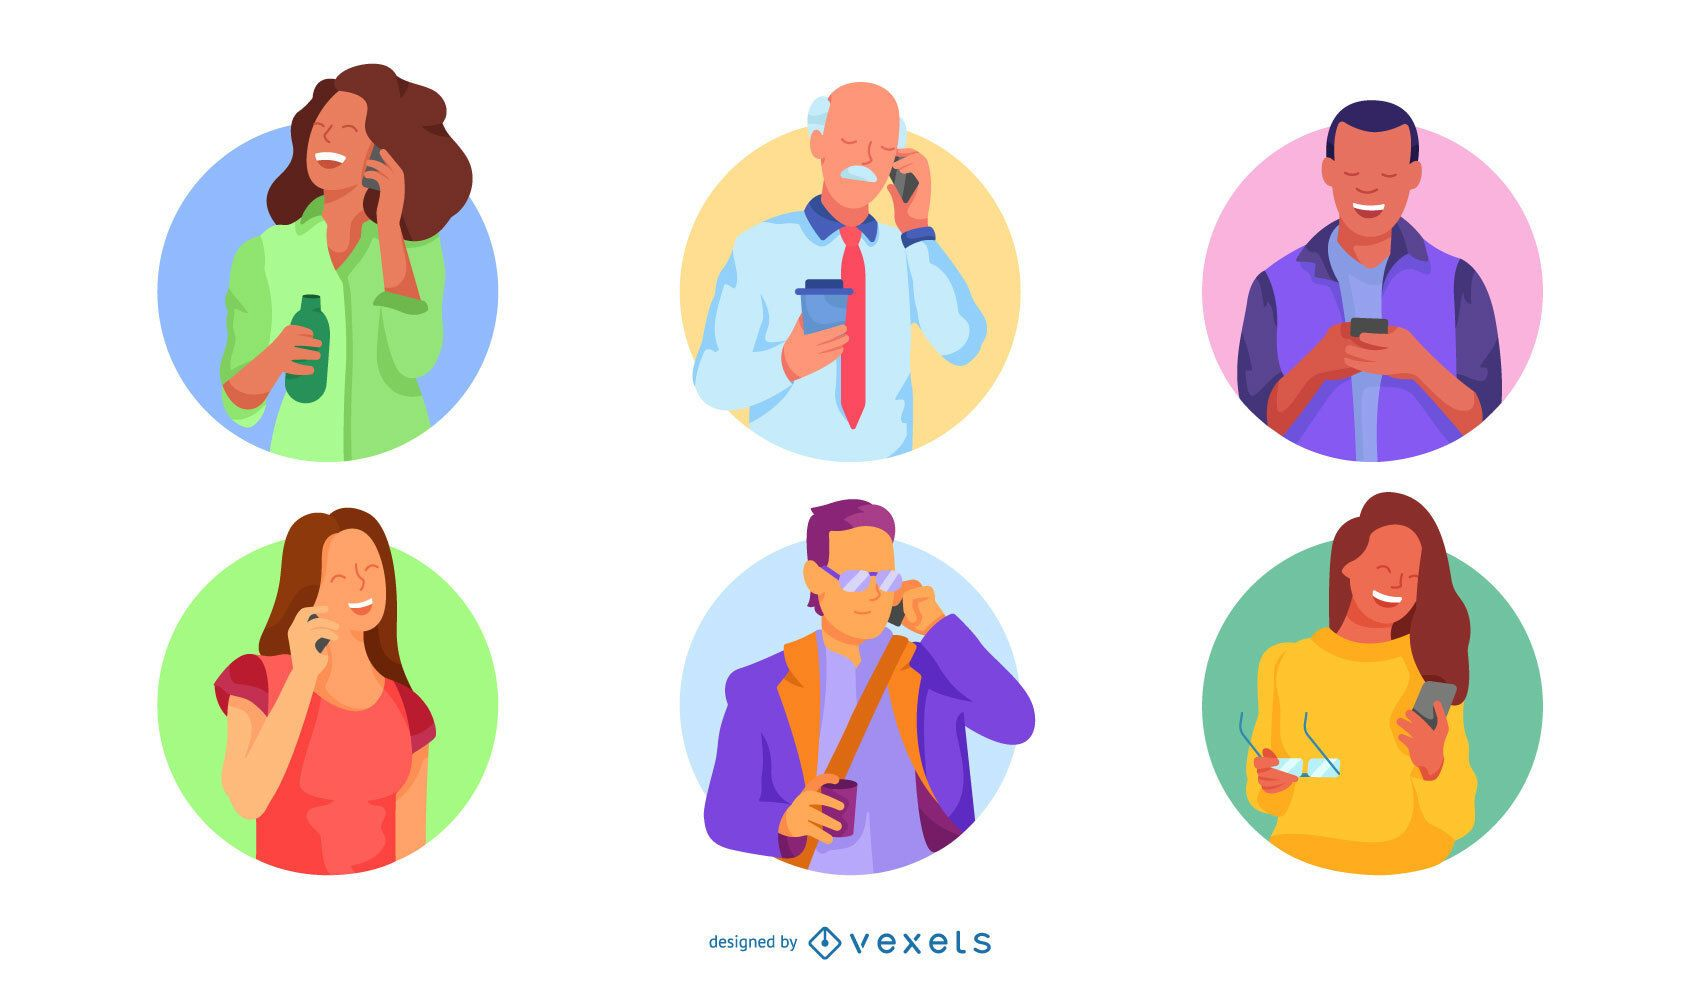 Paquete de personajes planos de llamadas telefónicas